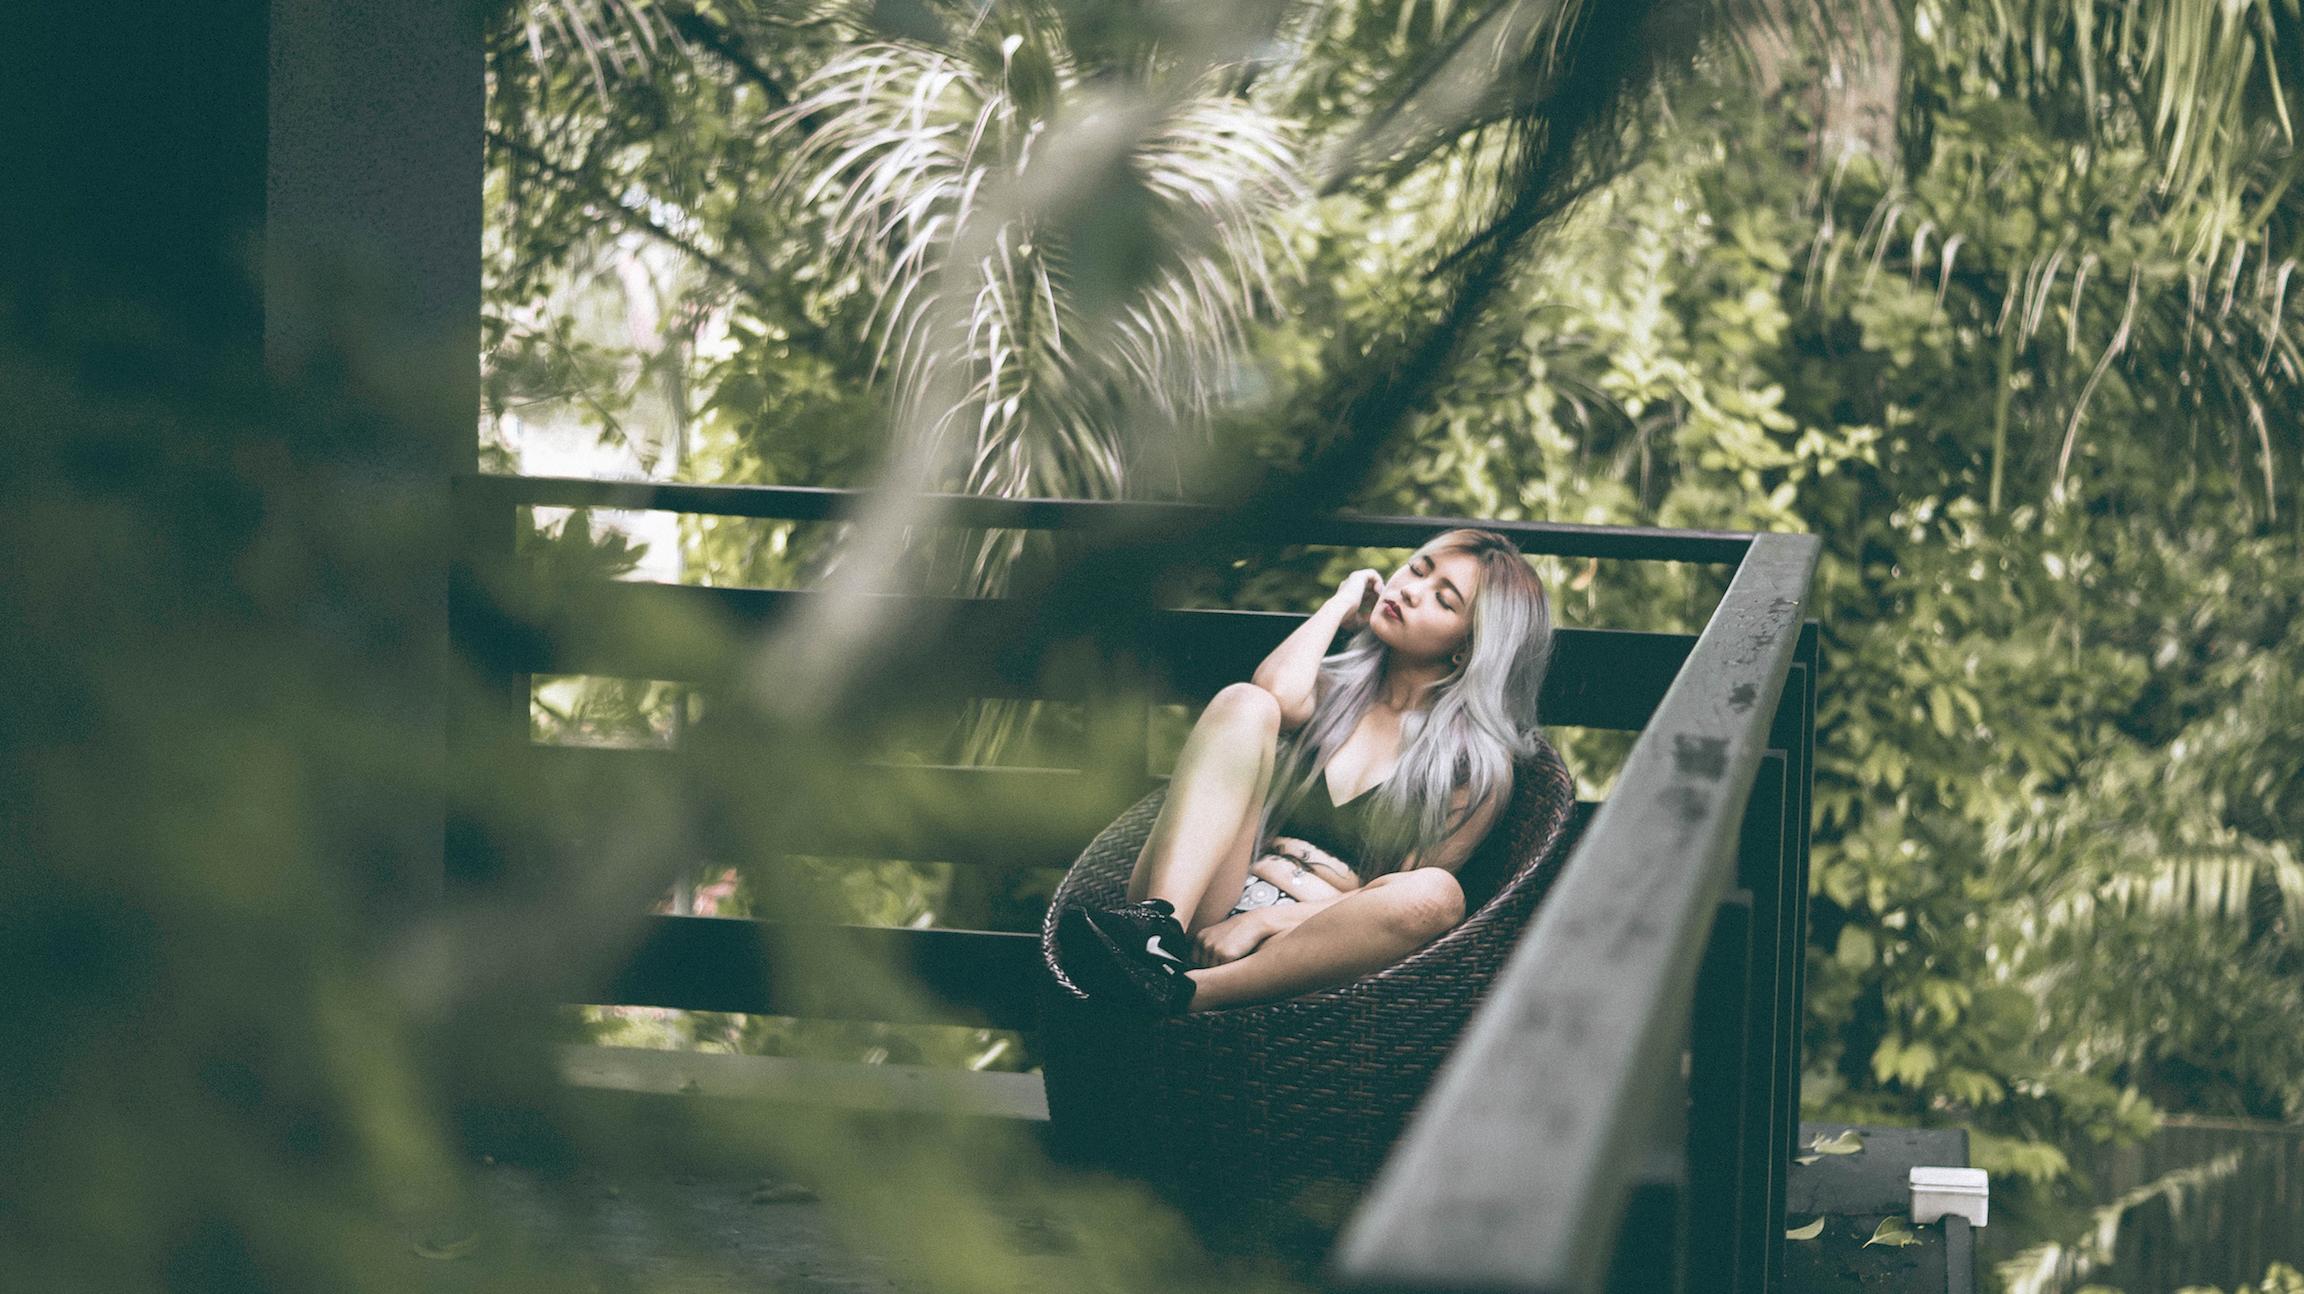 girl_green_balcony.jpeg